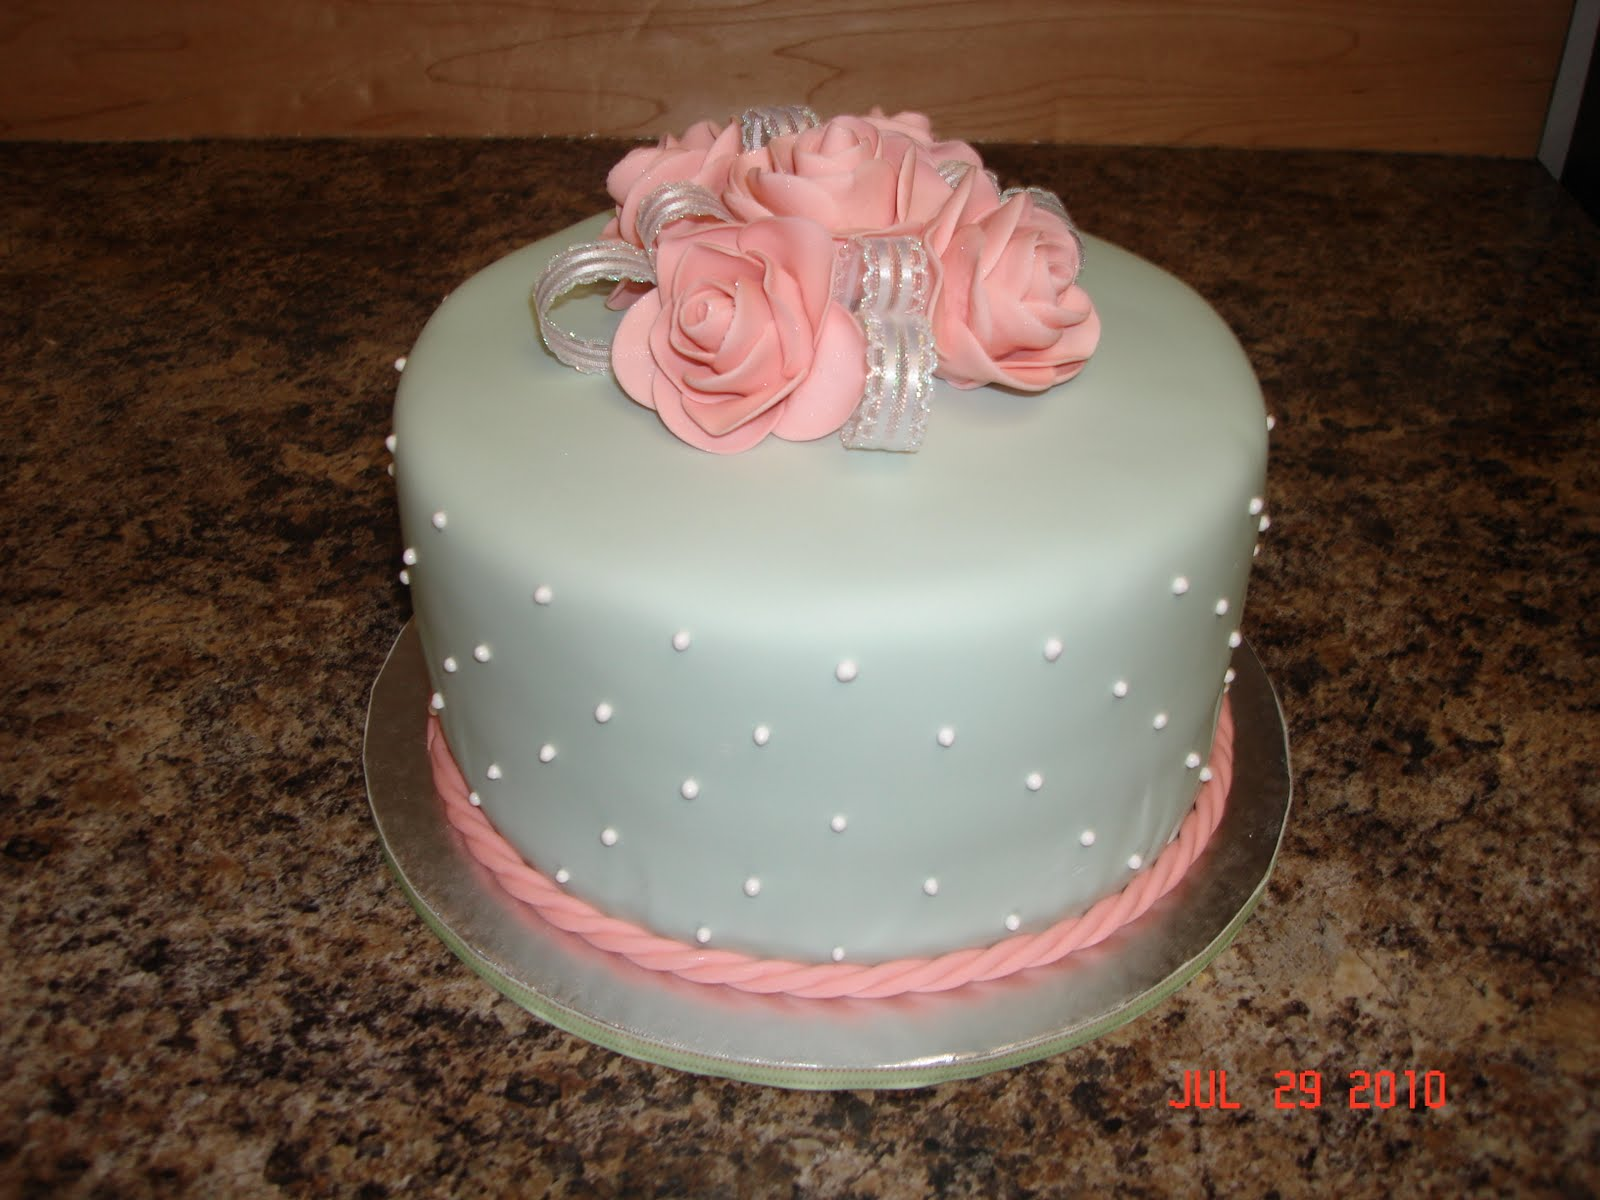 Custom Cakes By Denise July 2010